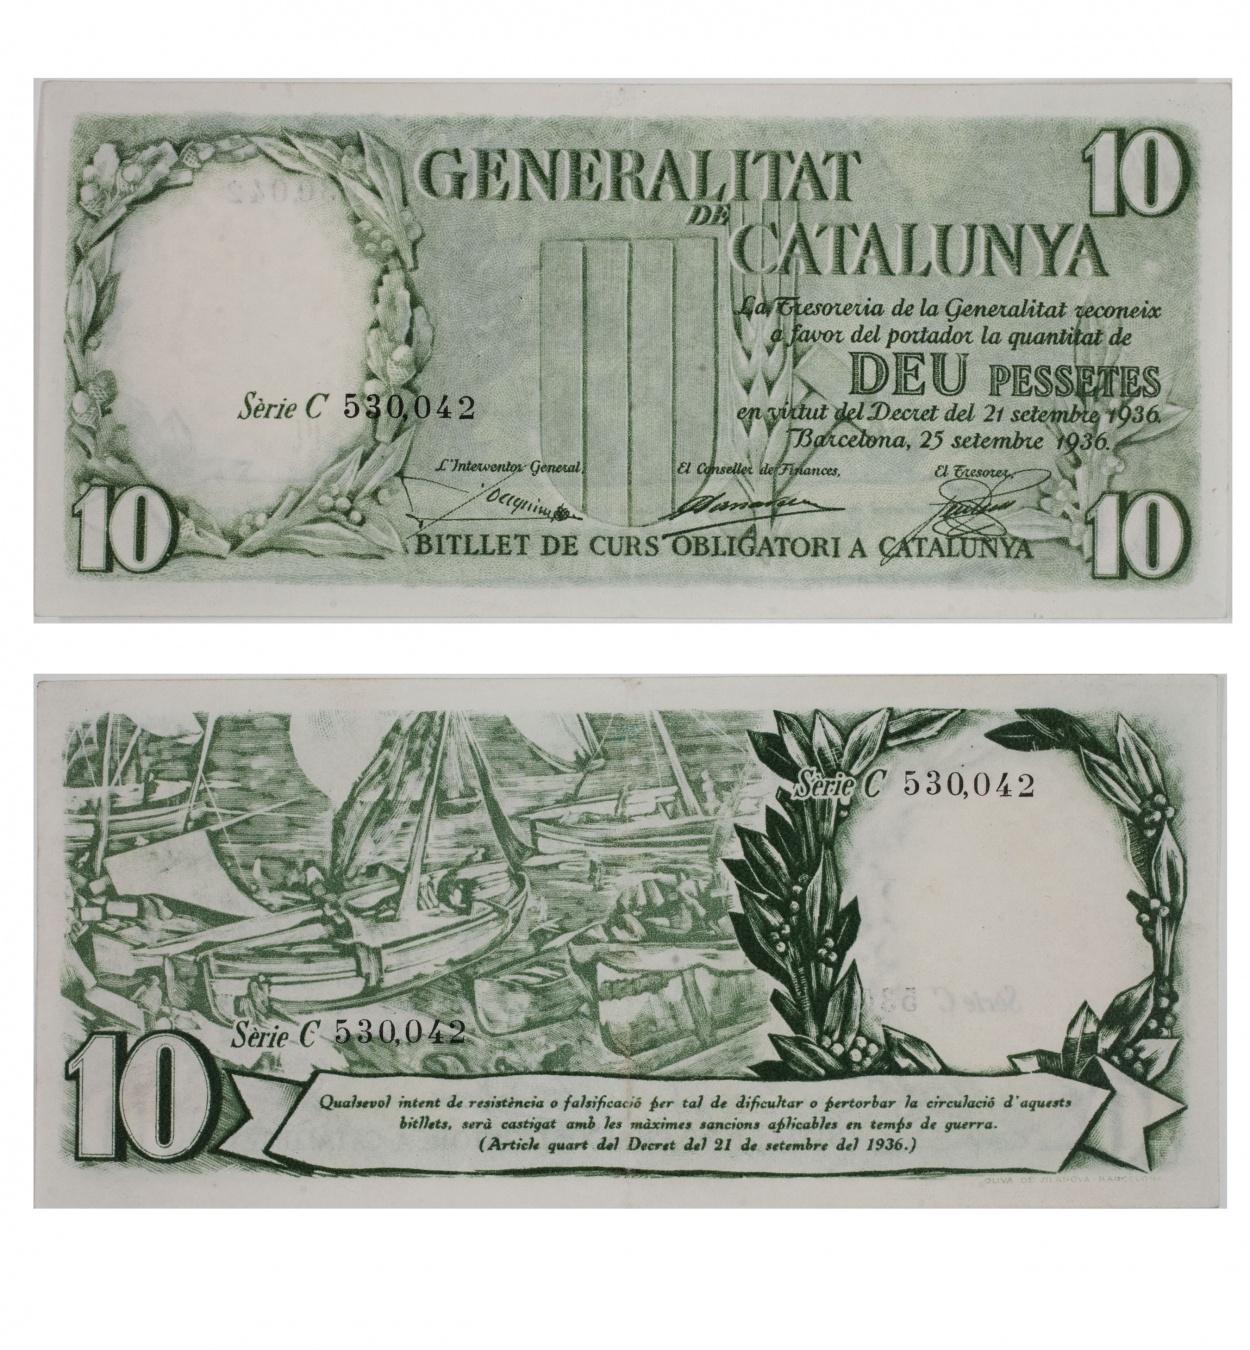 Generalitat de Catalunya - 10 pesetas - 1936